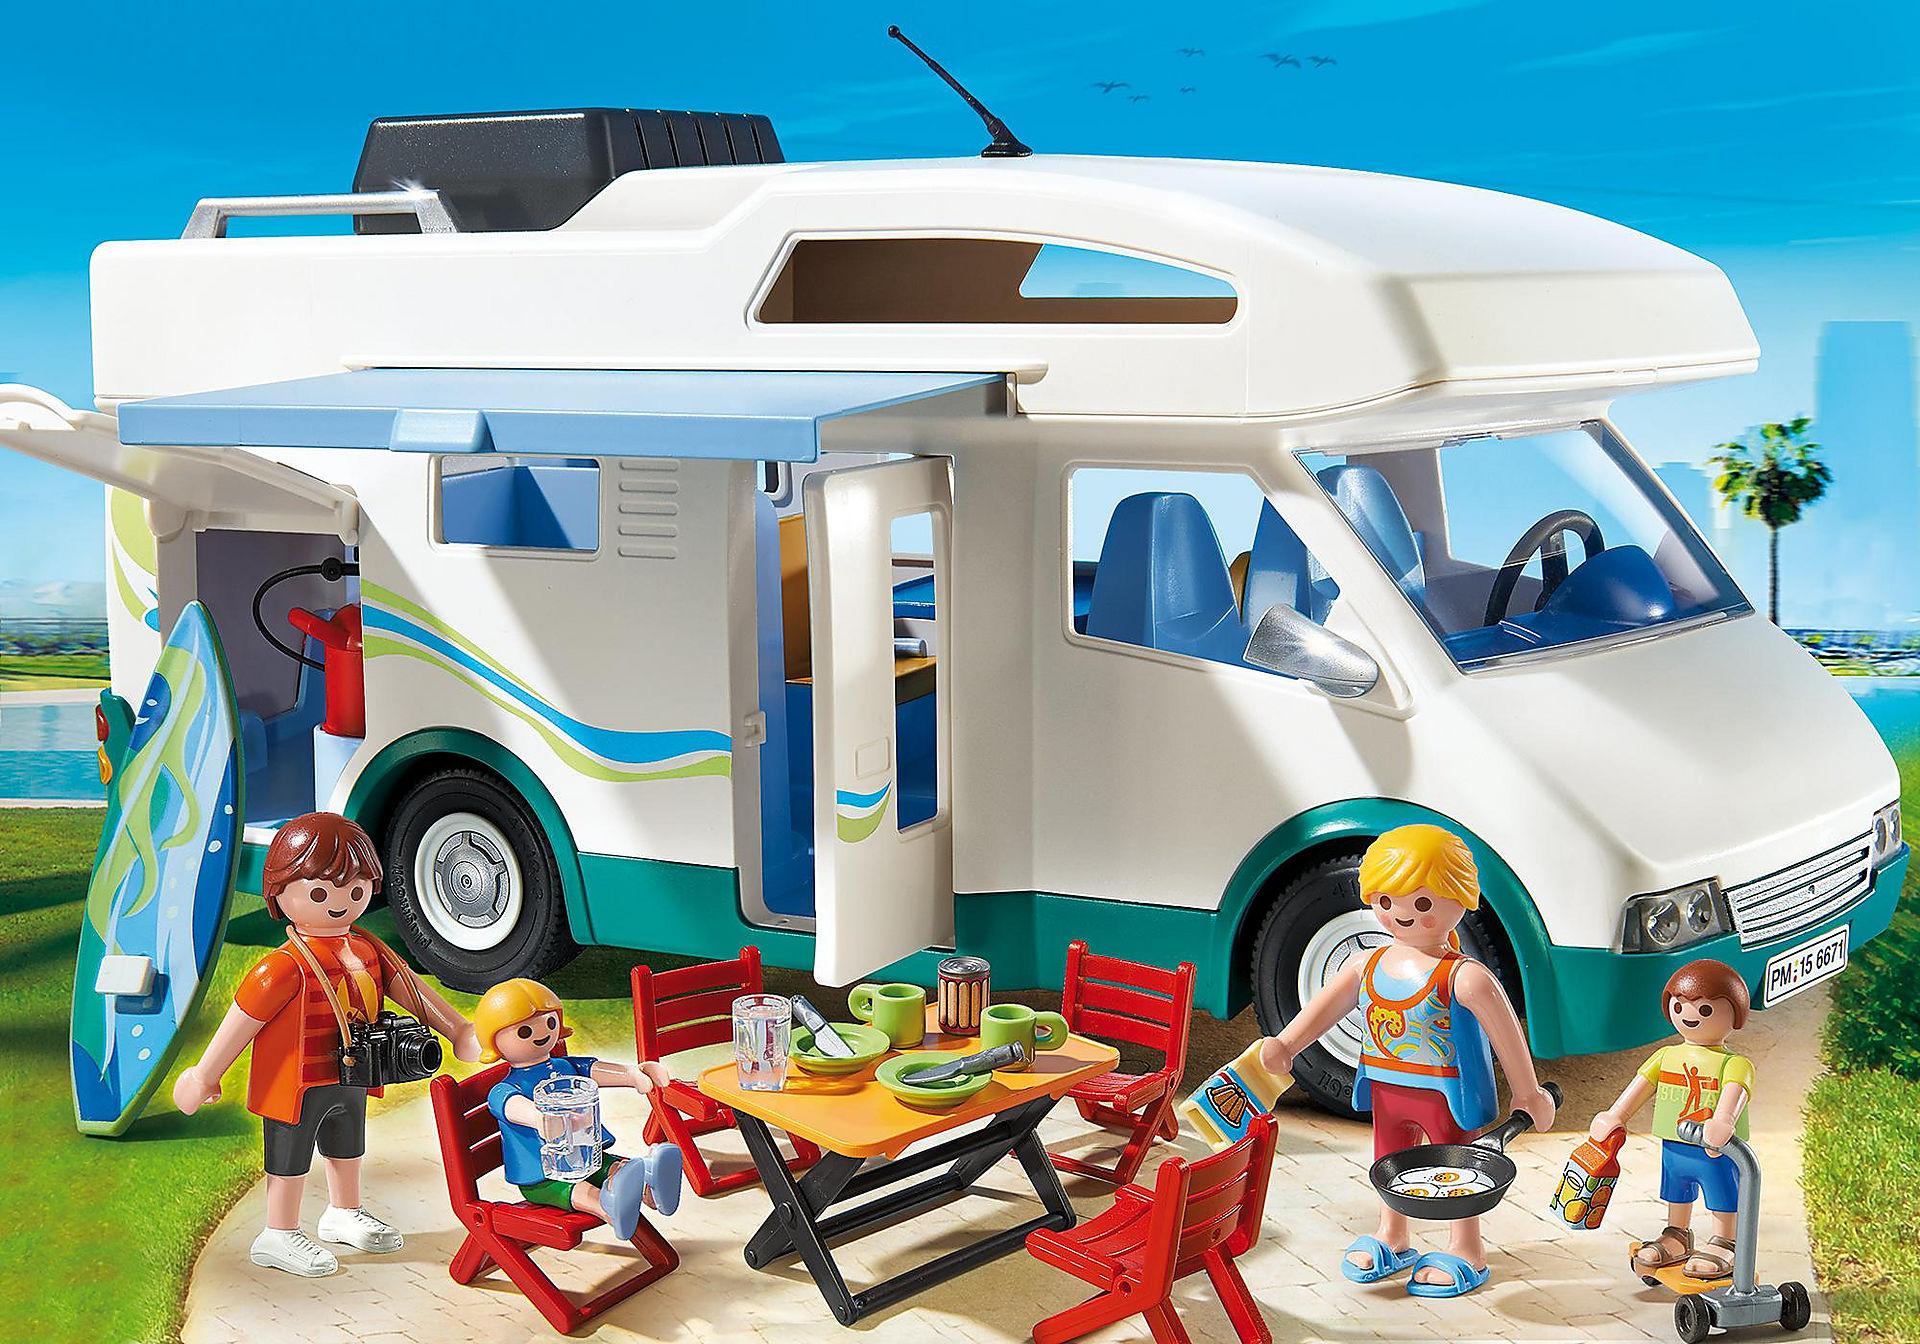 http://media.playmobil.com/i/playmobil/6671_product_detail/Οικογενειακό τροχόσπιτο